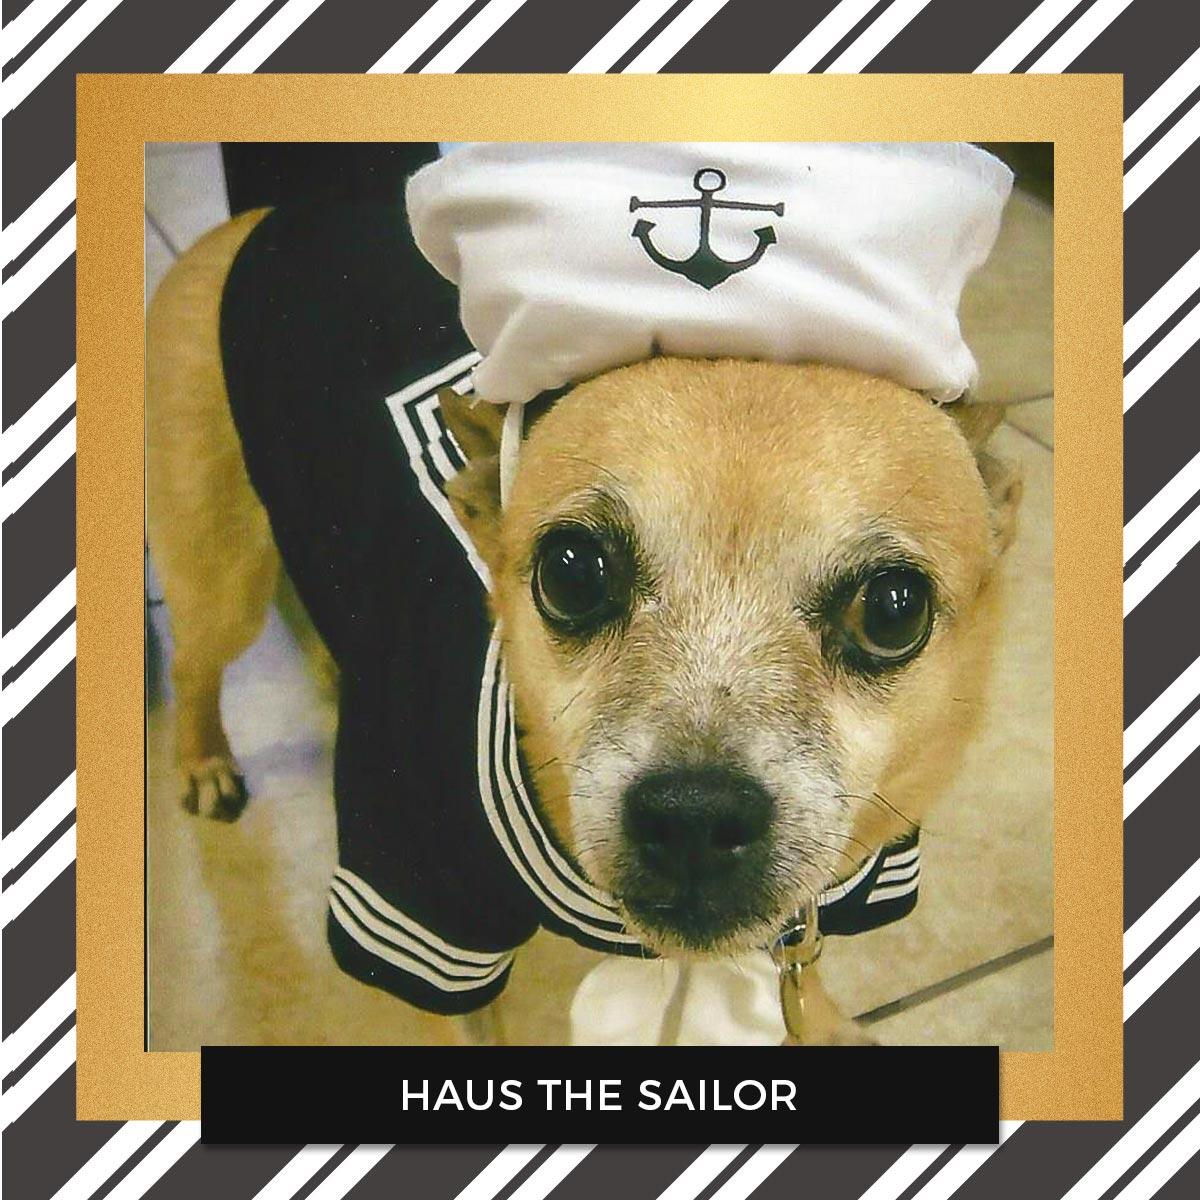 Haus - Halloween Pet Costume Contest Entry